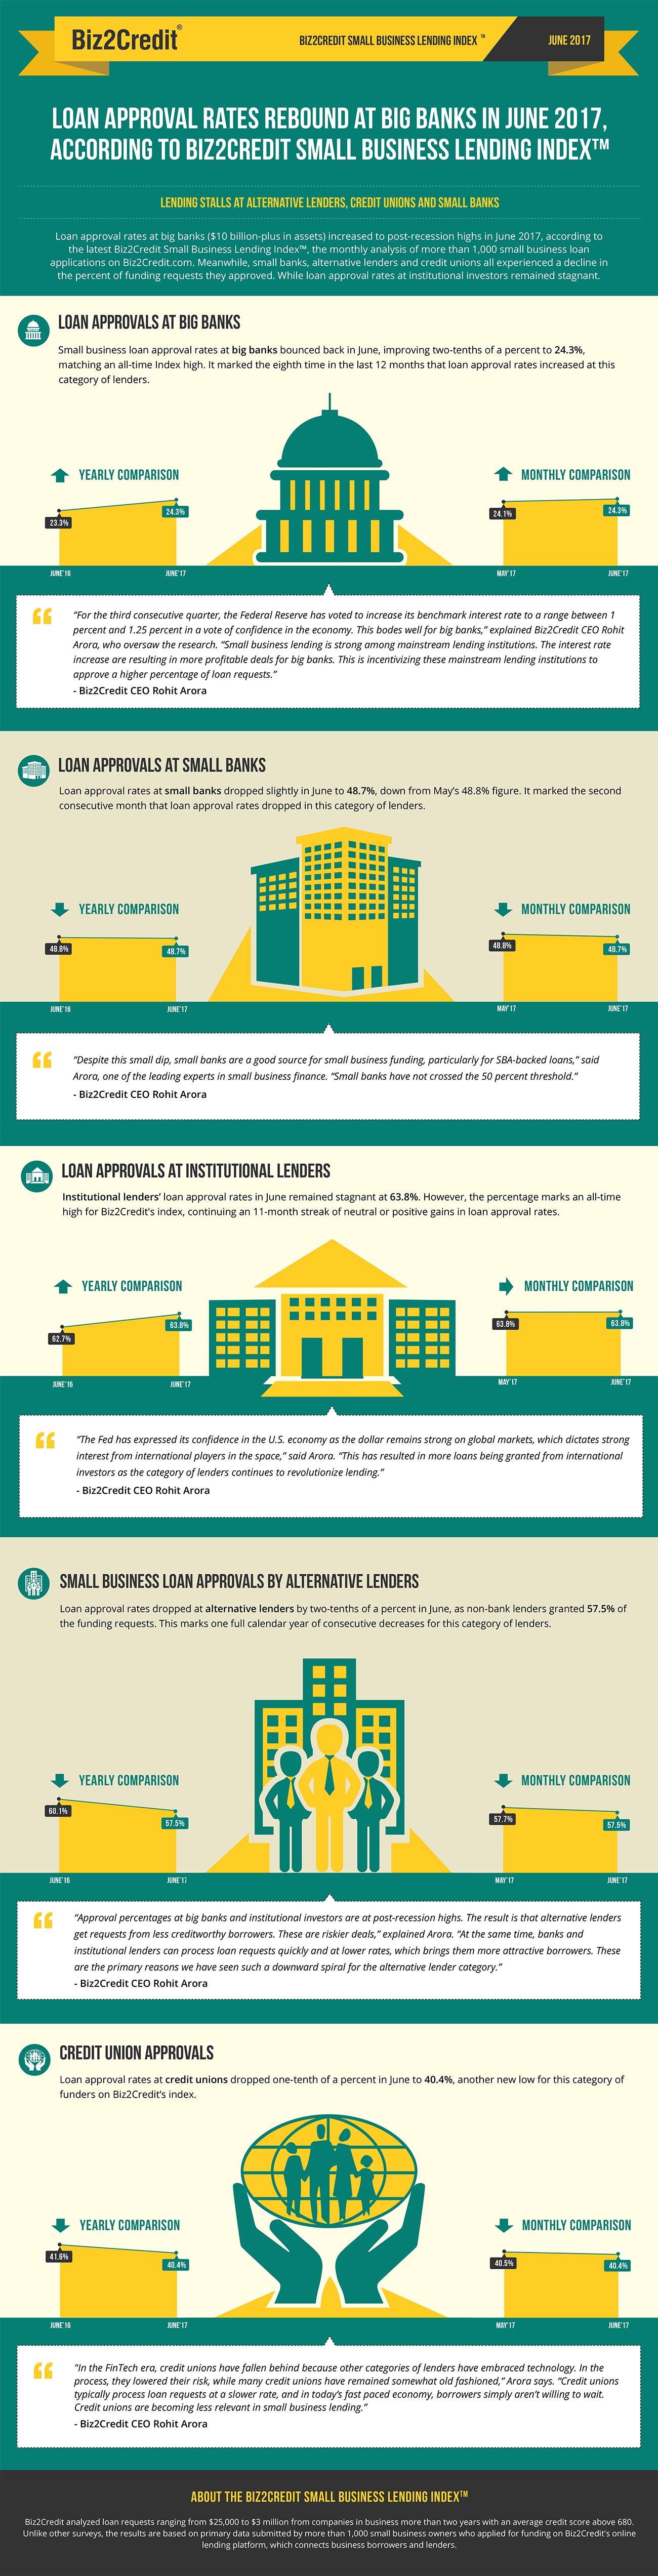 jun17 Lending Index Infographic